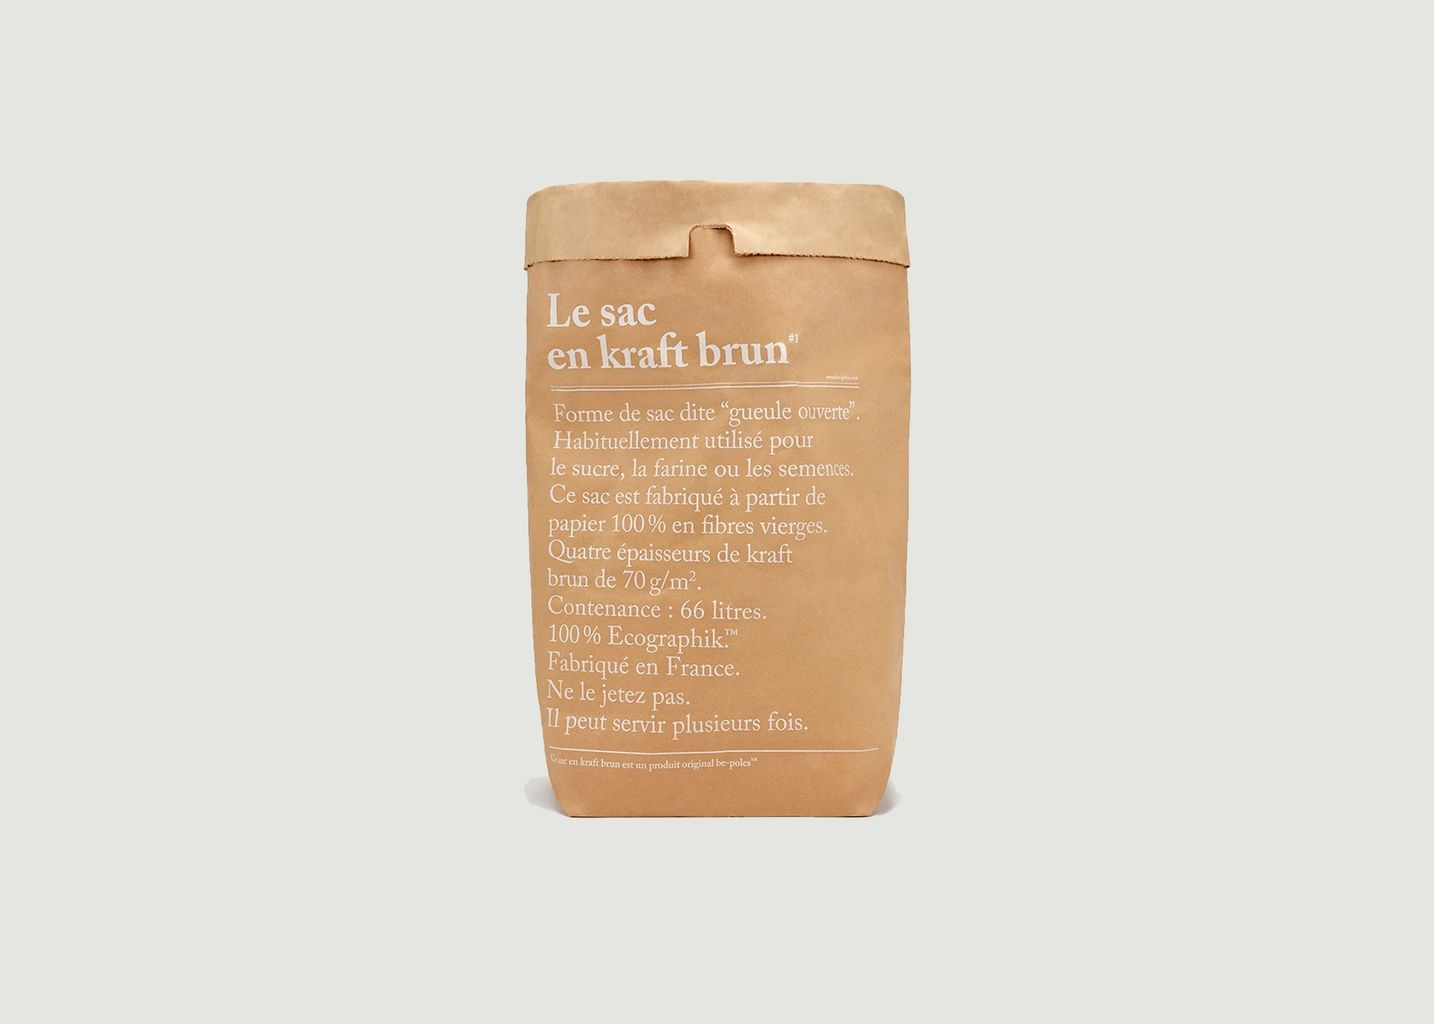 Le Sac en Kraft Brun  - be-poles